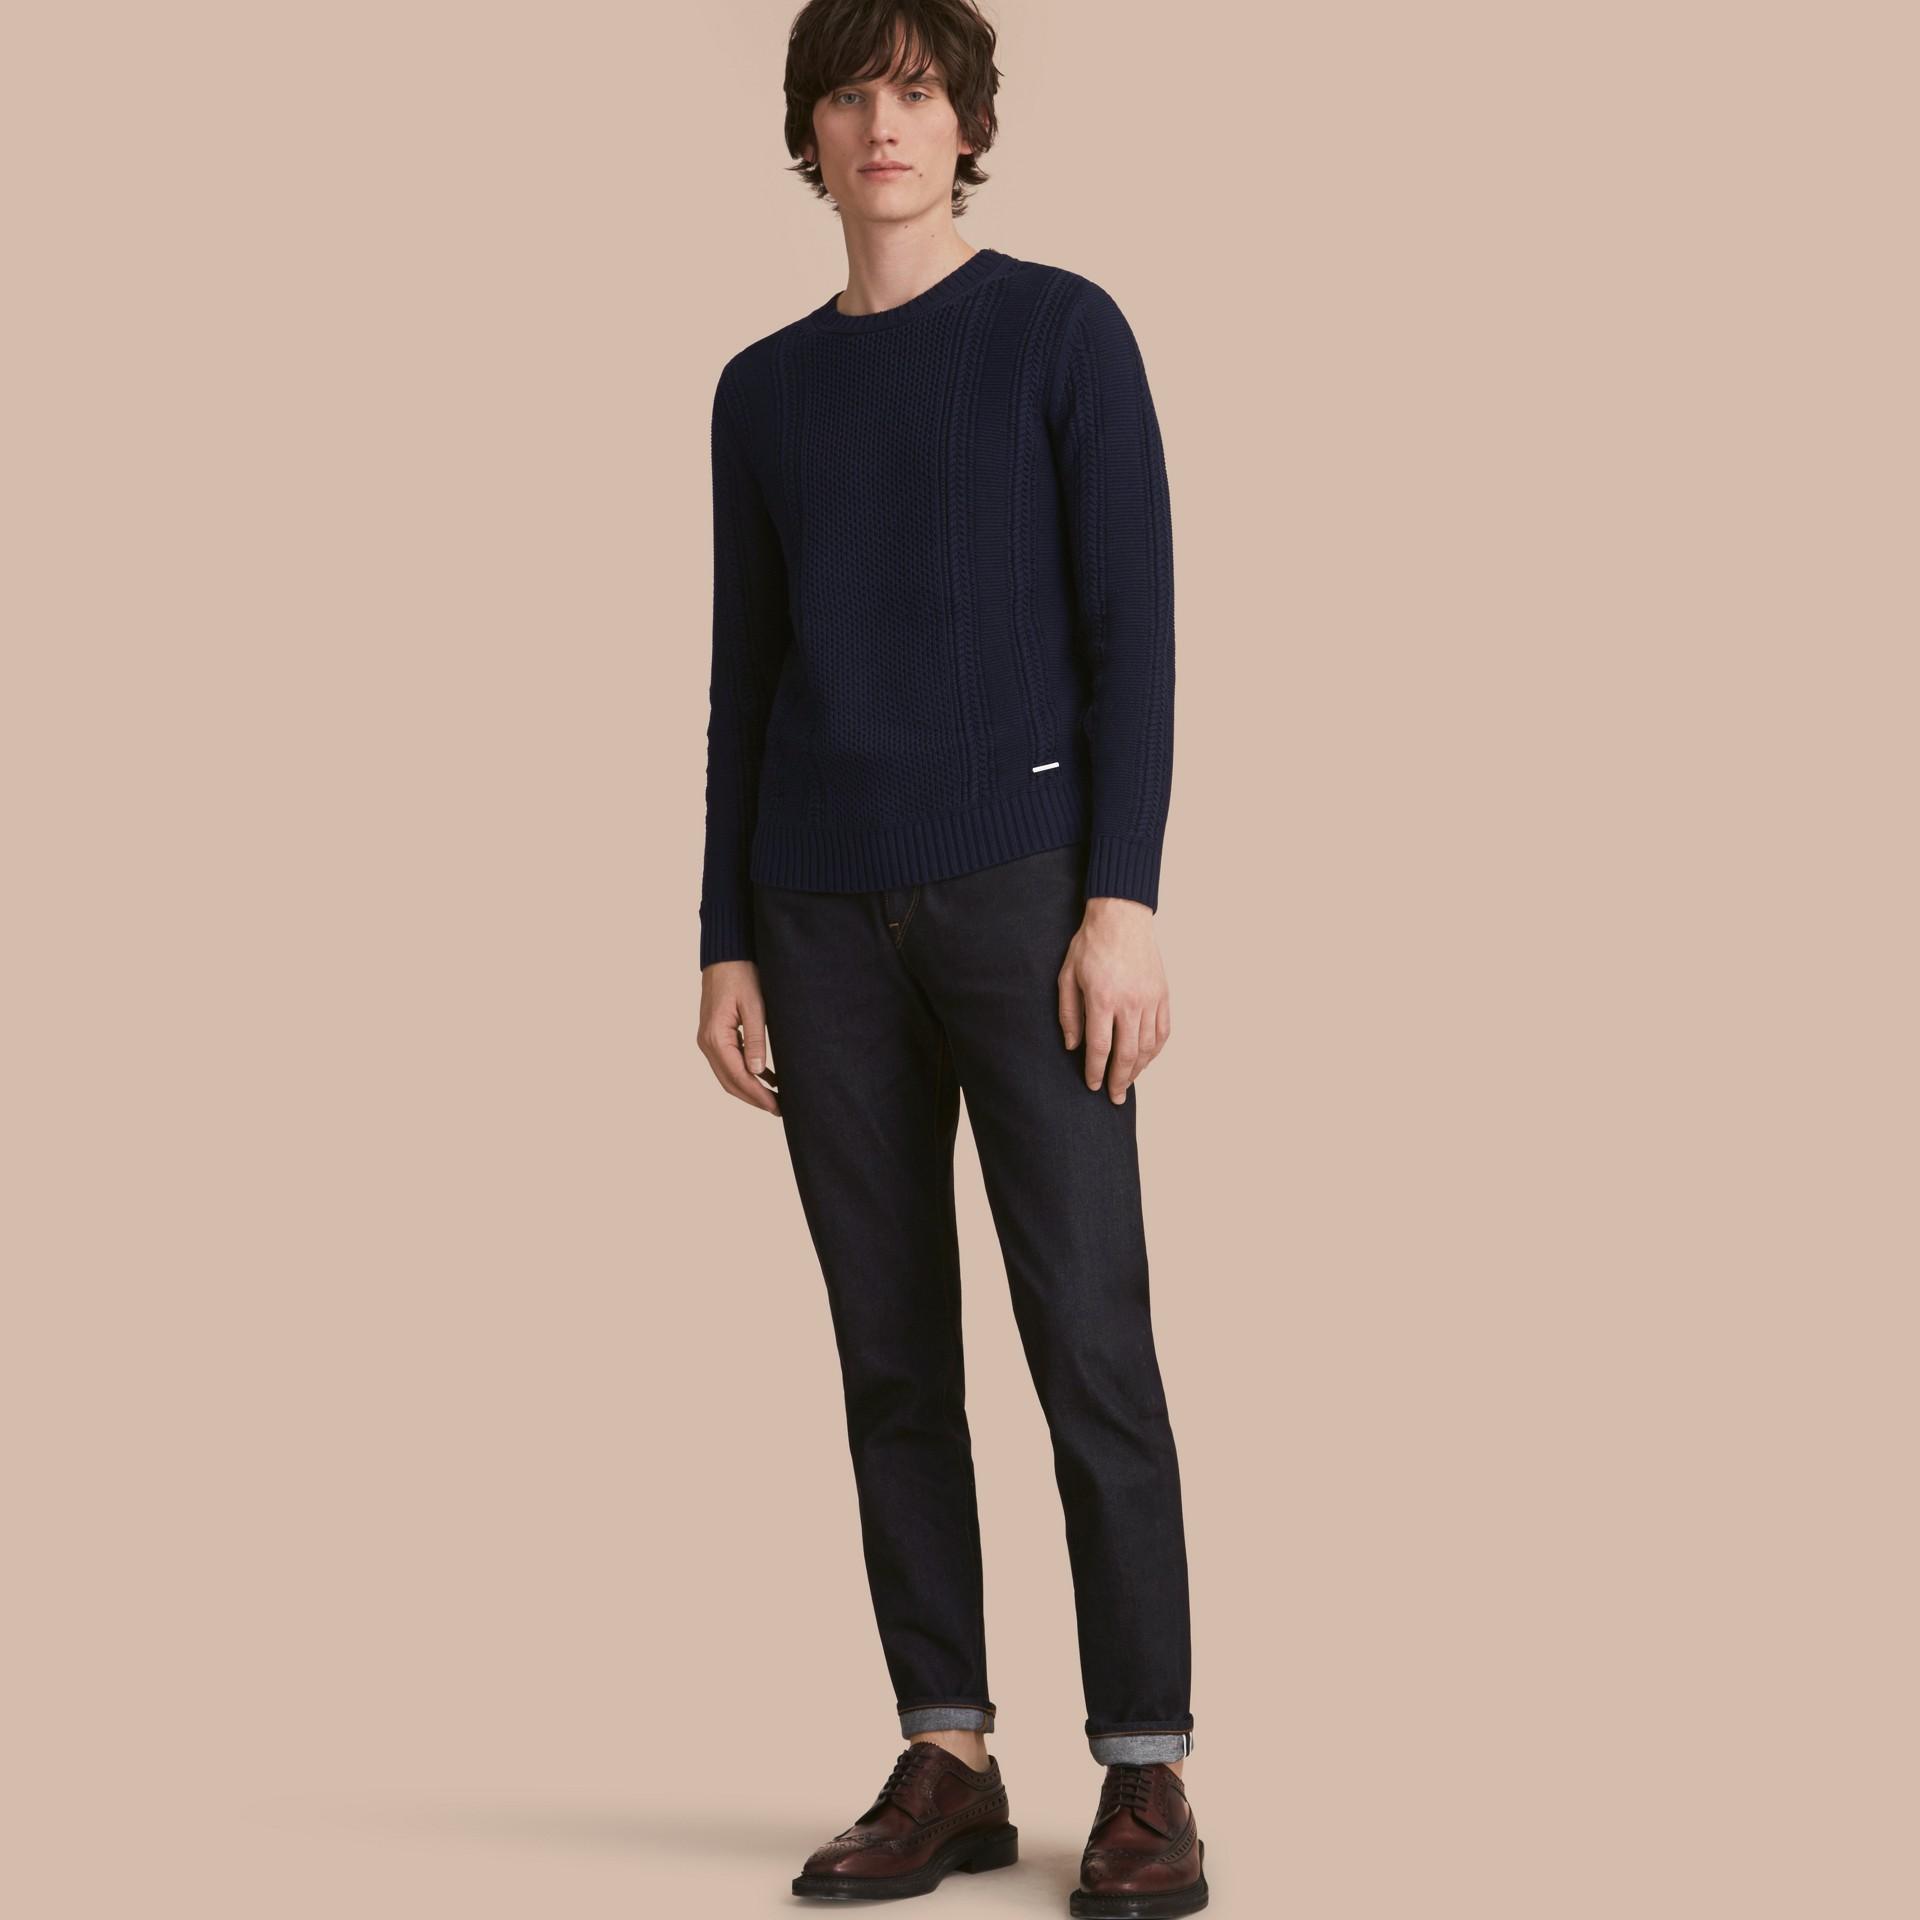 Zip Detail Aran Knit Cotton Sweater - gallery image 1